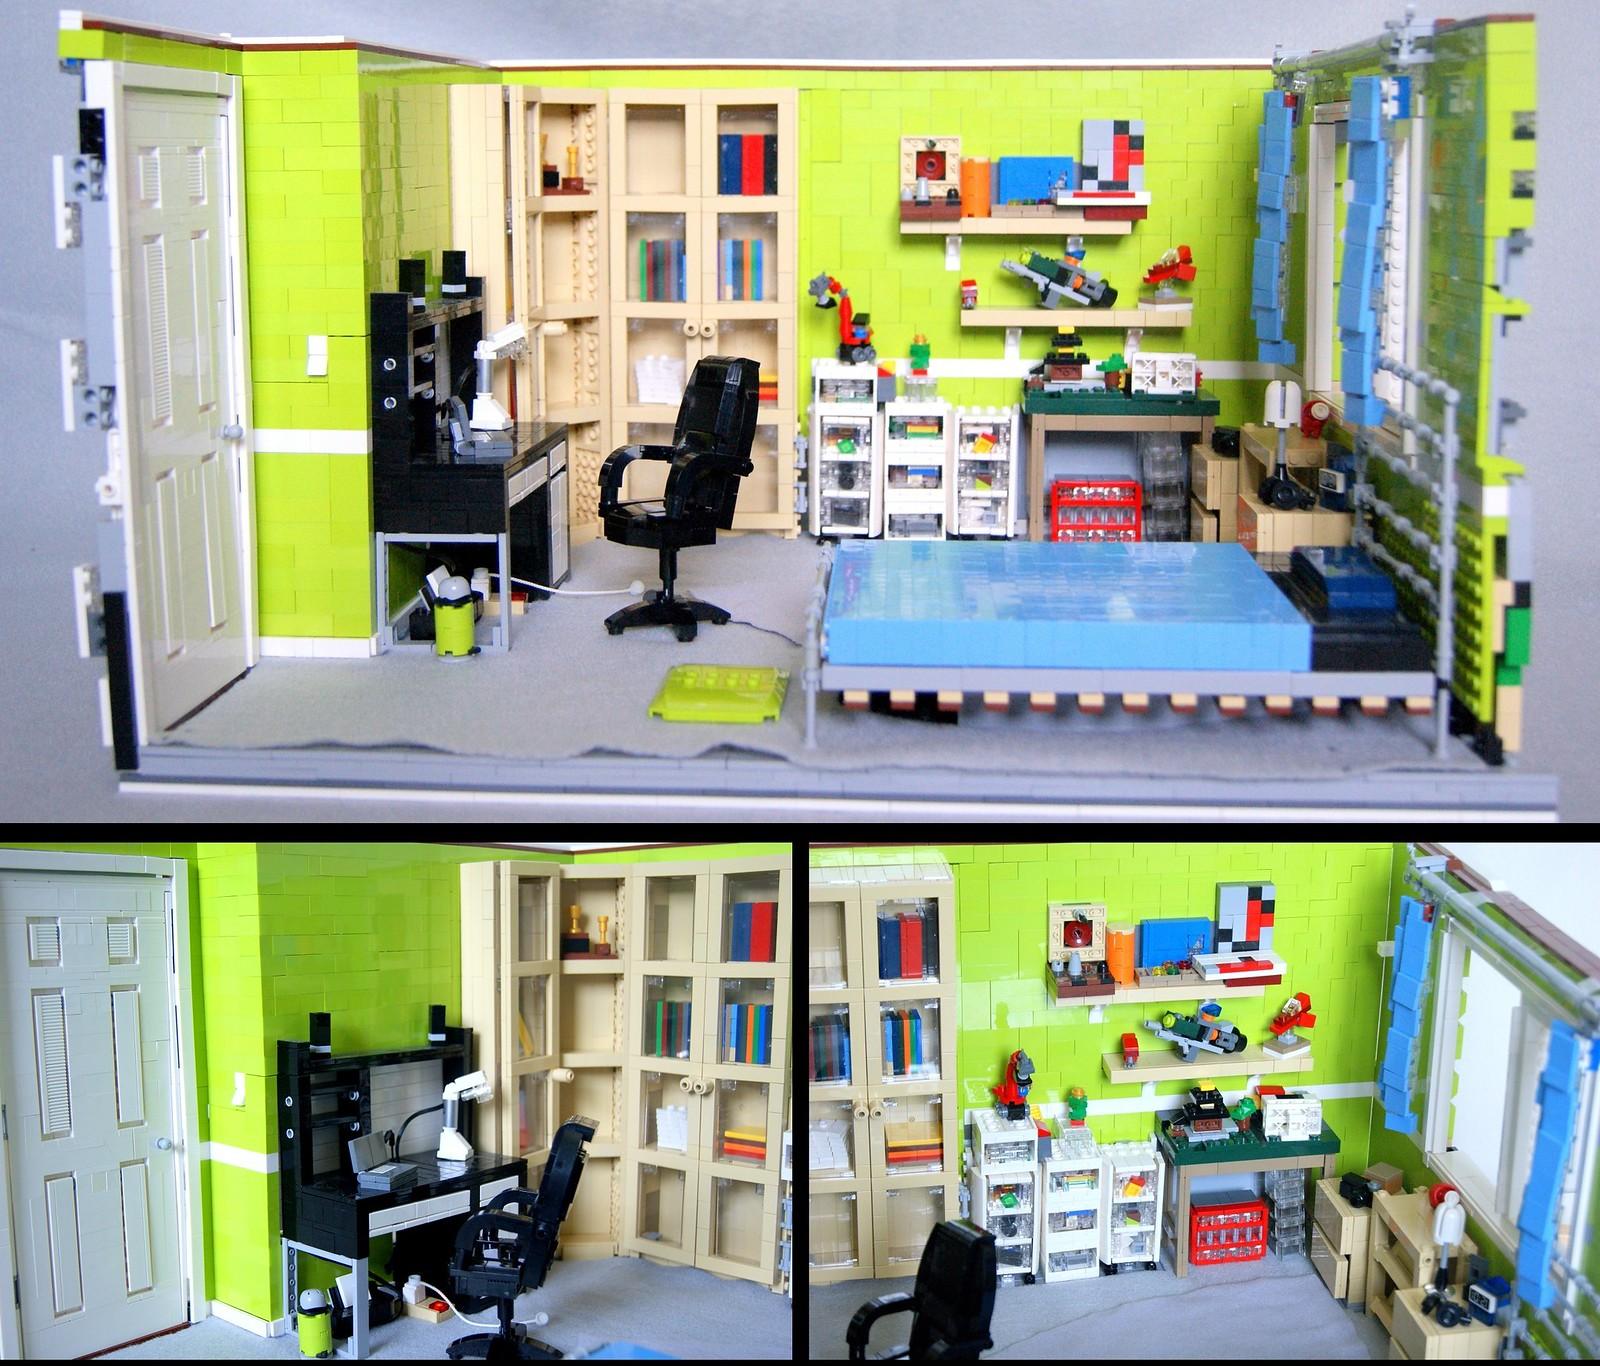 Lego Bedroom Lego Bedroom Bedroom Commission Lego Fan Graffiti Art Workshop